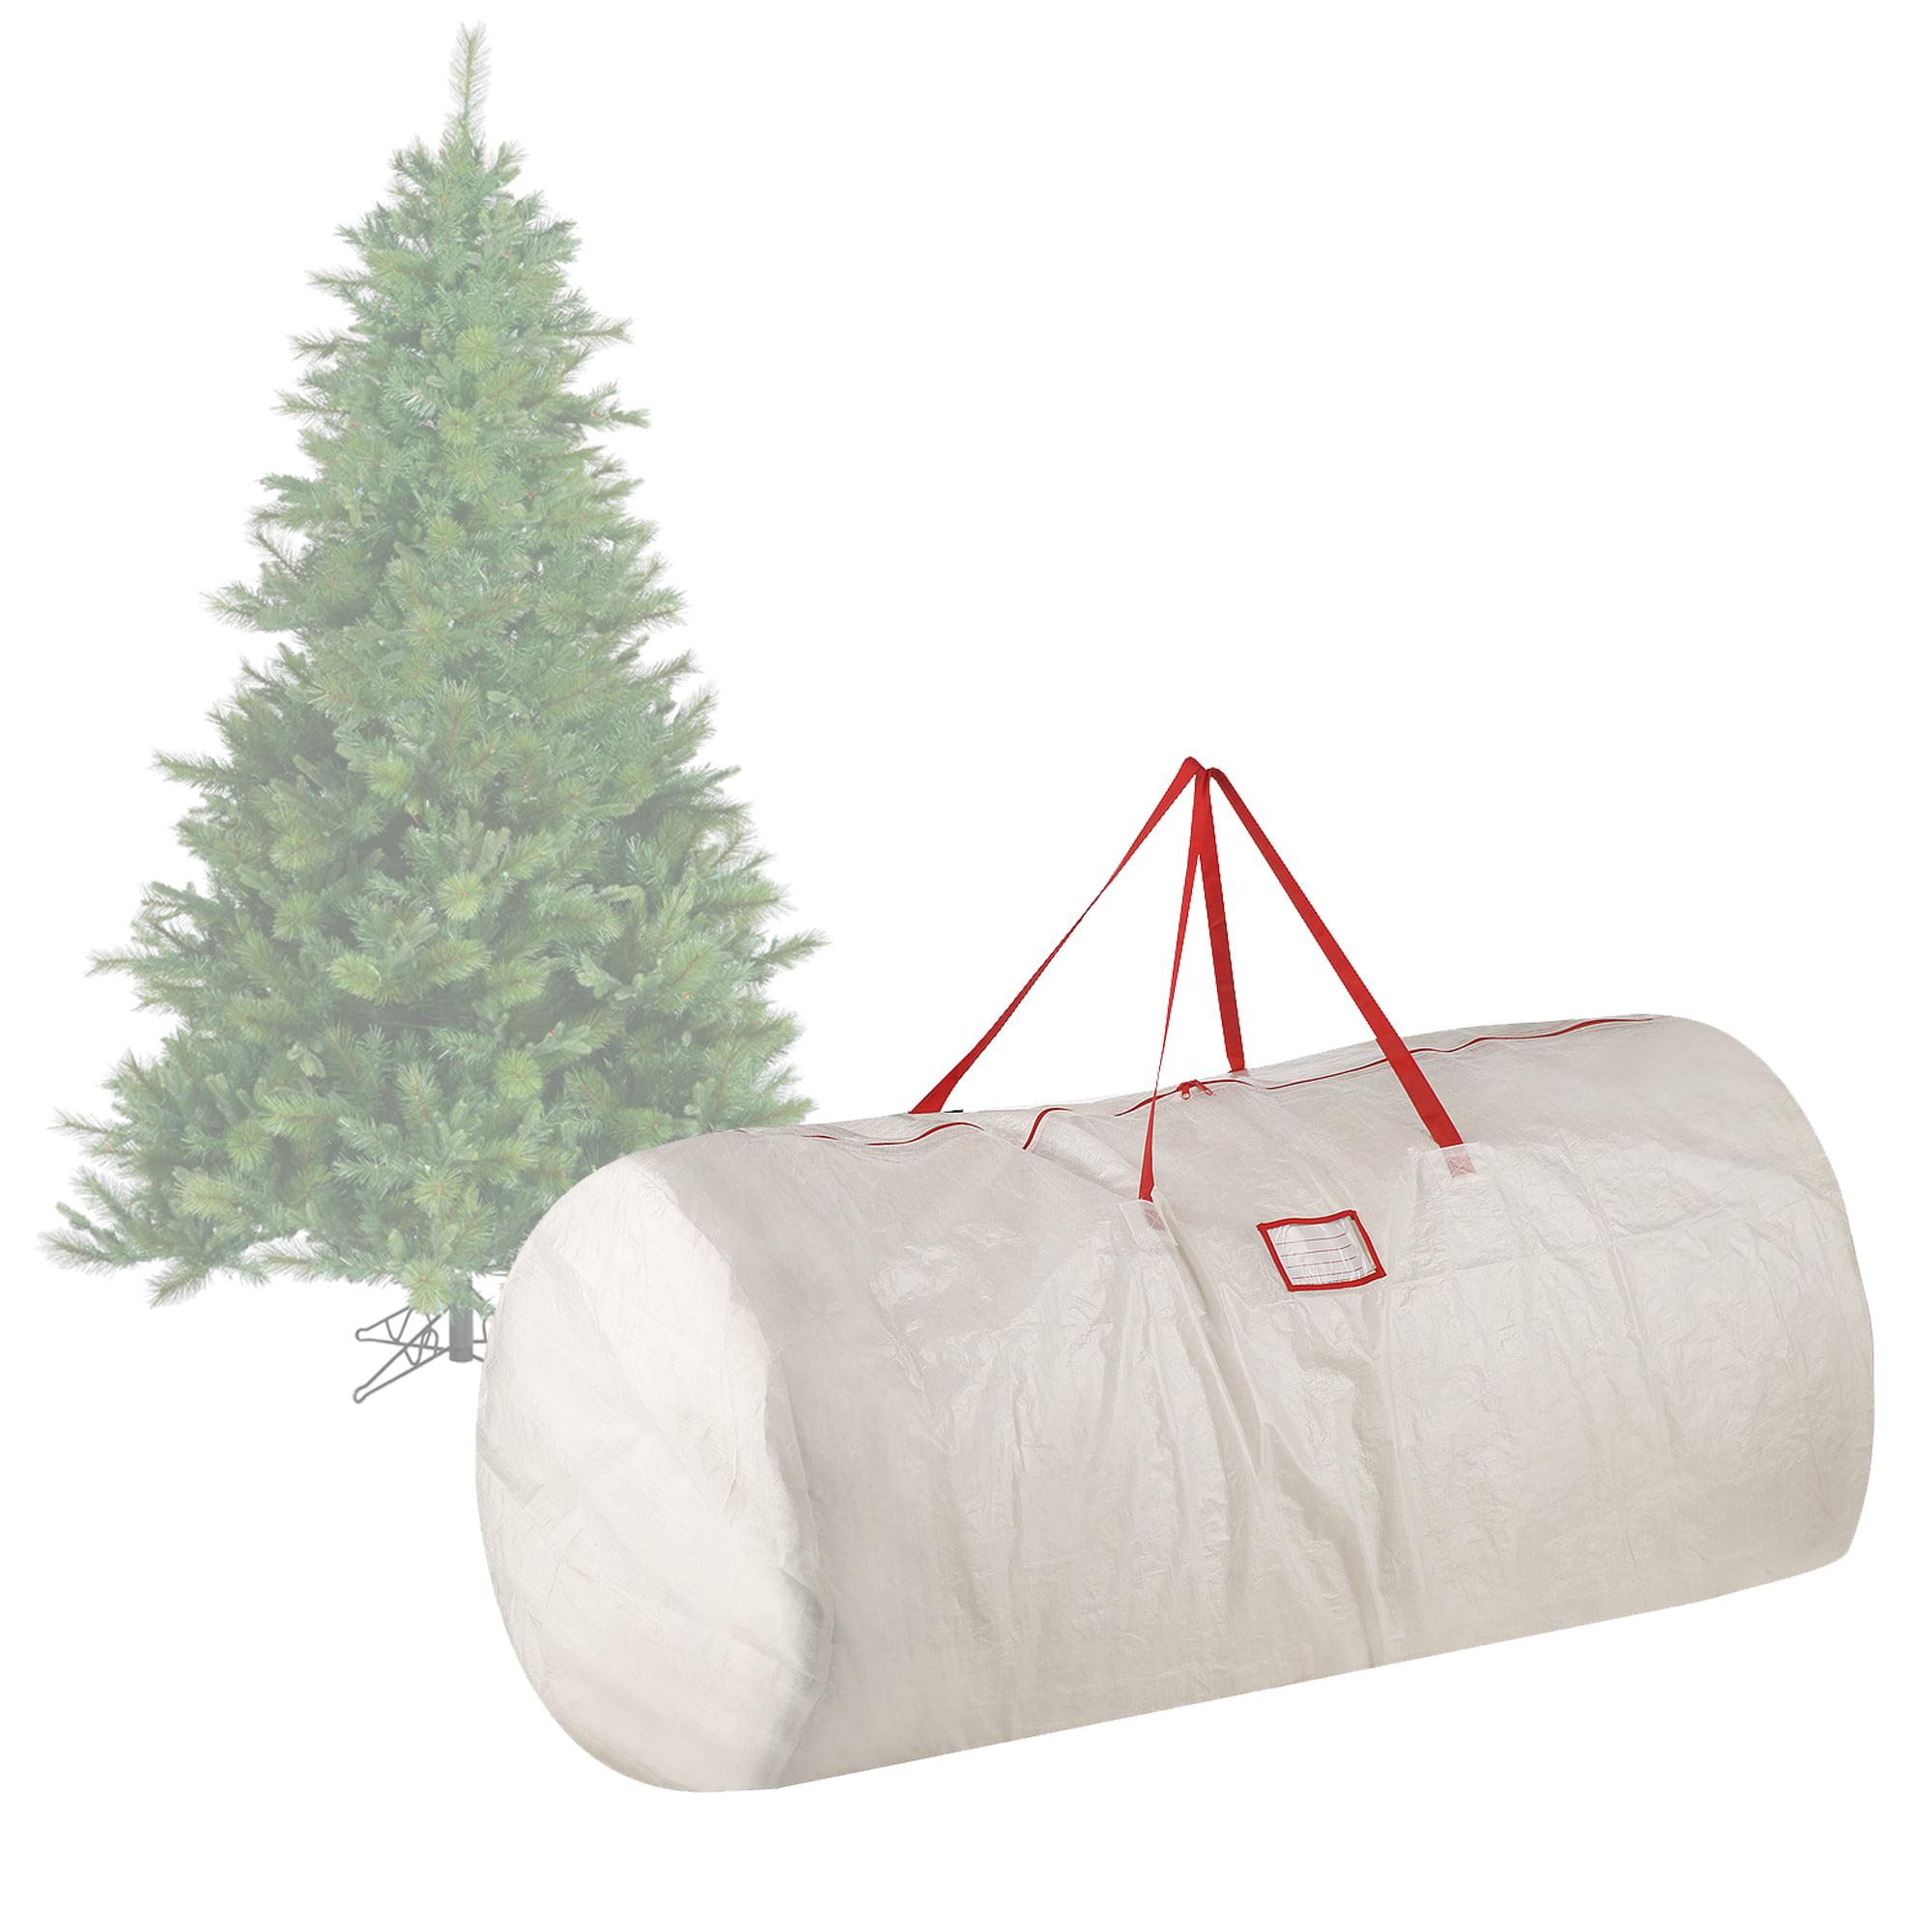 Elf Stor Premium White Holiday Christmas Tree Storage Bag Large For 9 Foot Tree